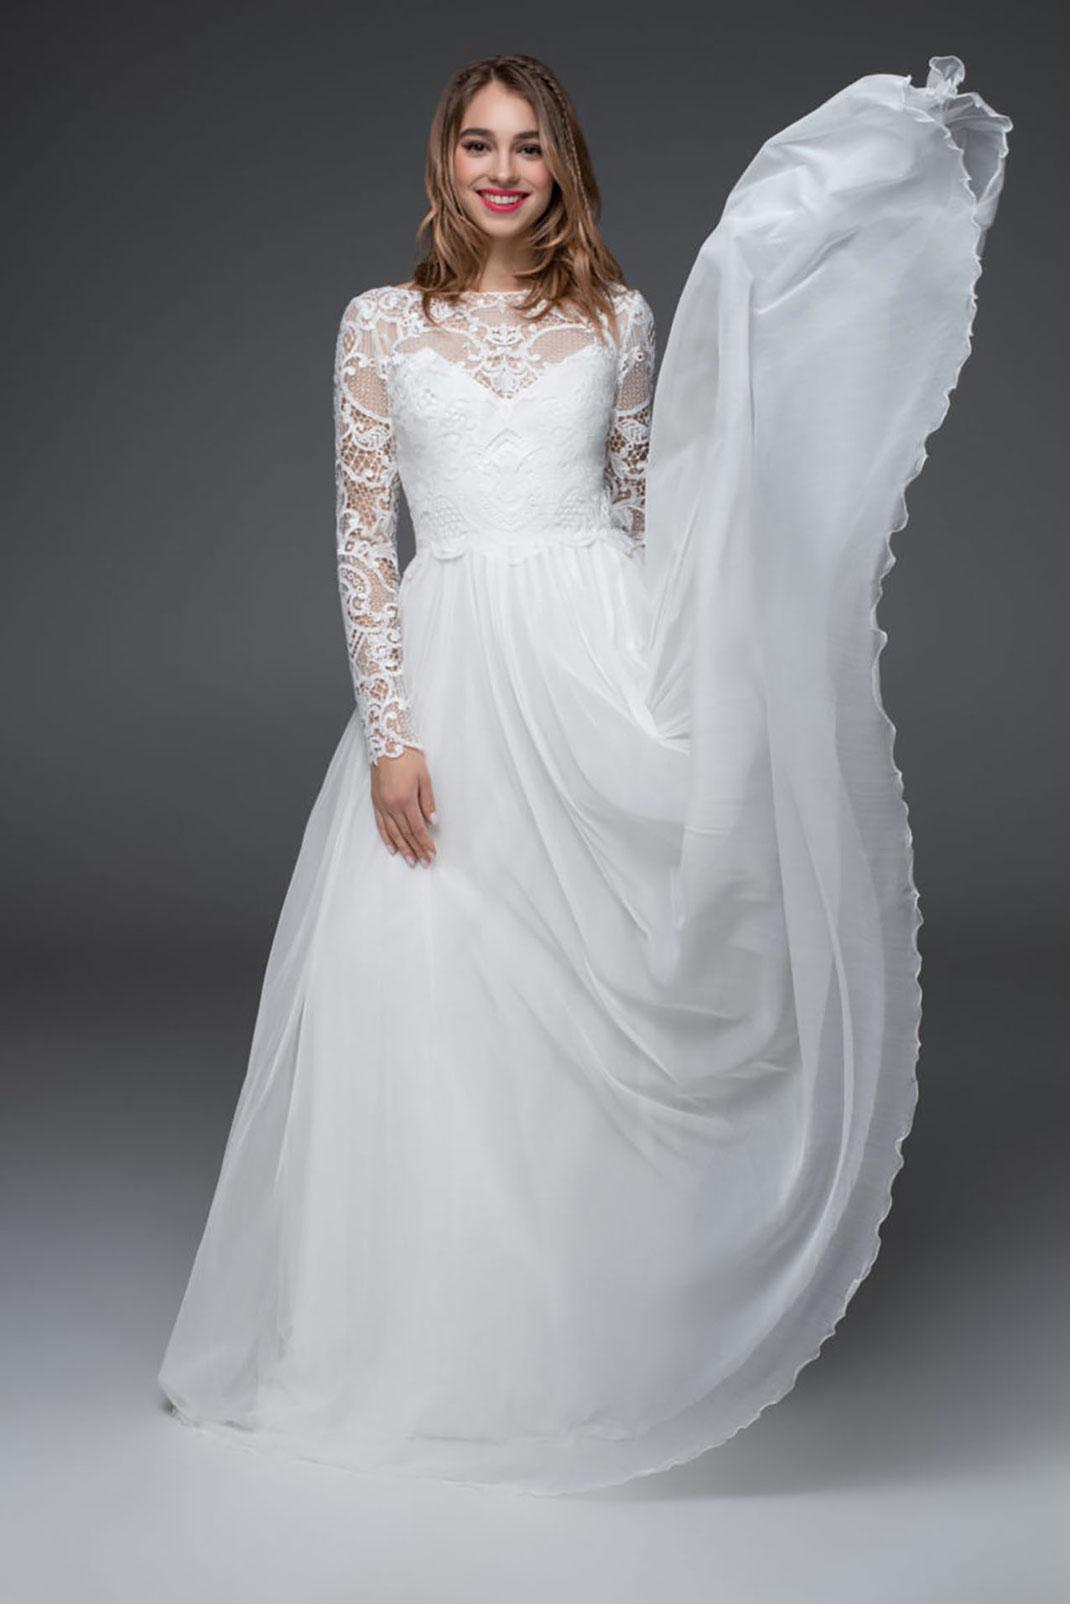 Brautkleid Bronte aus der Sadoni 2022 Kollektion